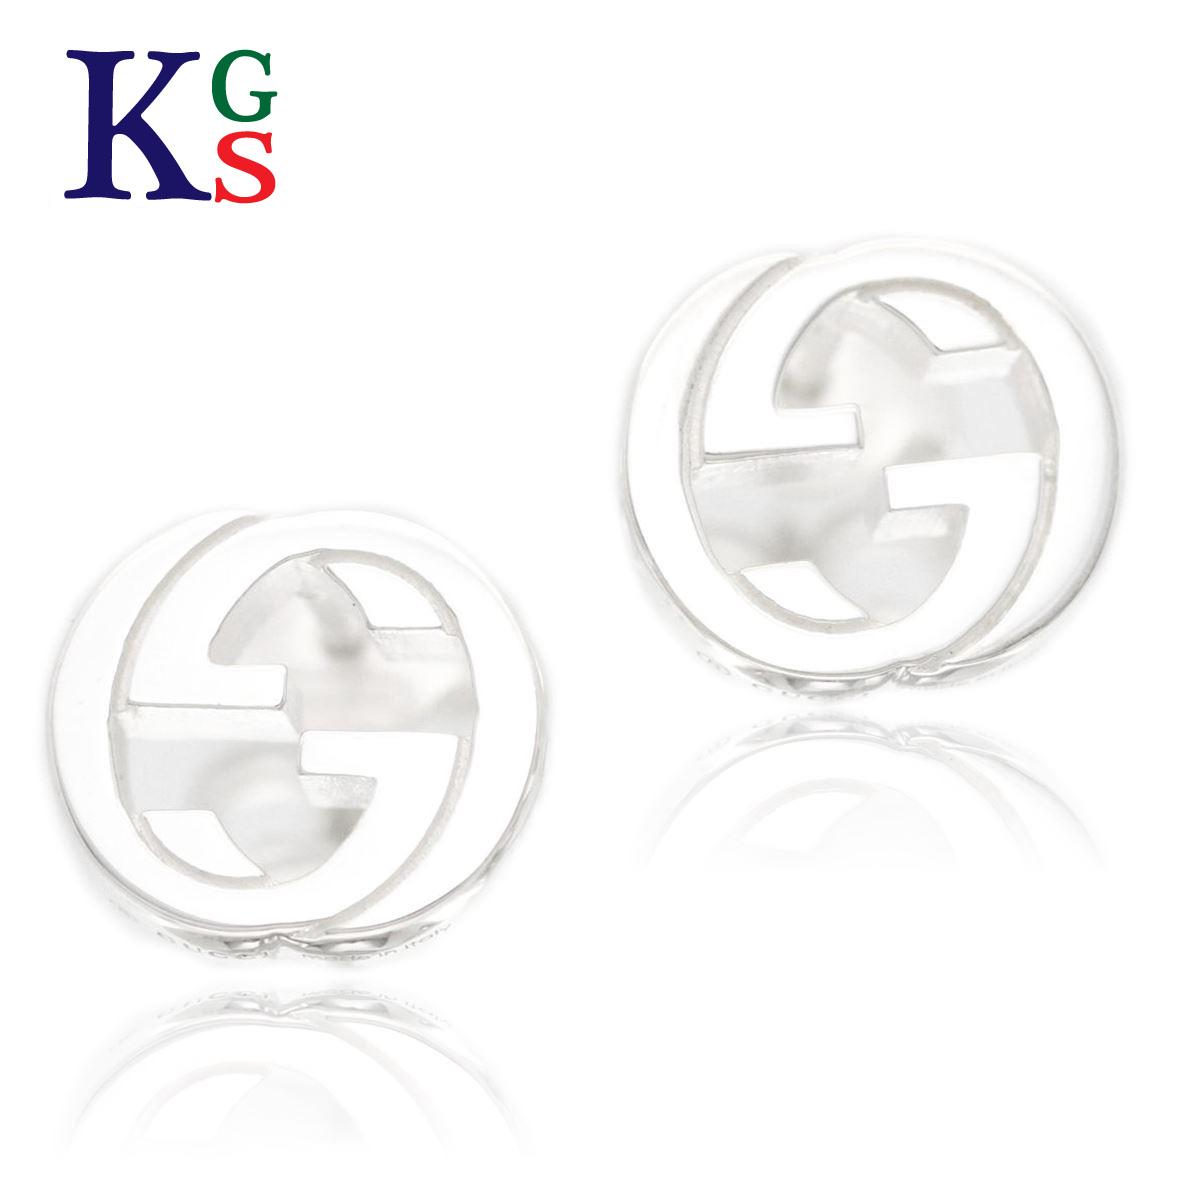 601b53feb8a karyon  Gucci  GUCCI Lady s jewelry GG logo stud bolt pierced earrings  silver Ag925 356289-J8400-0702